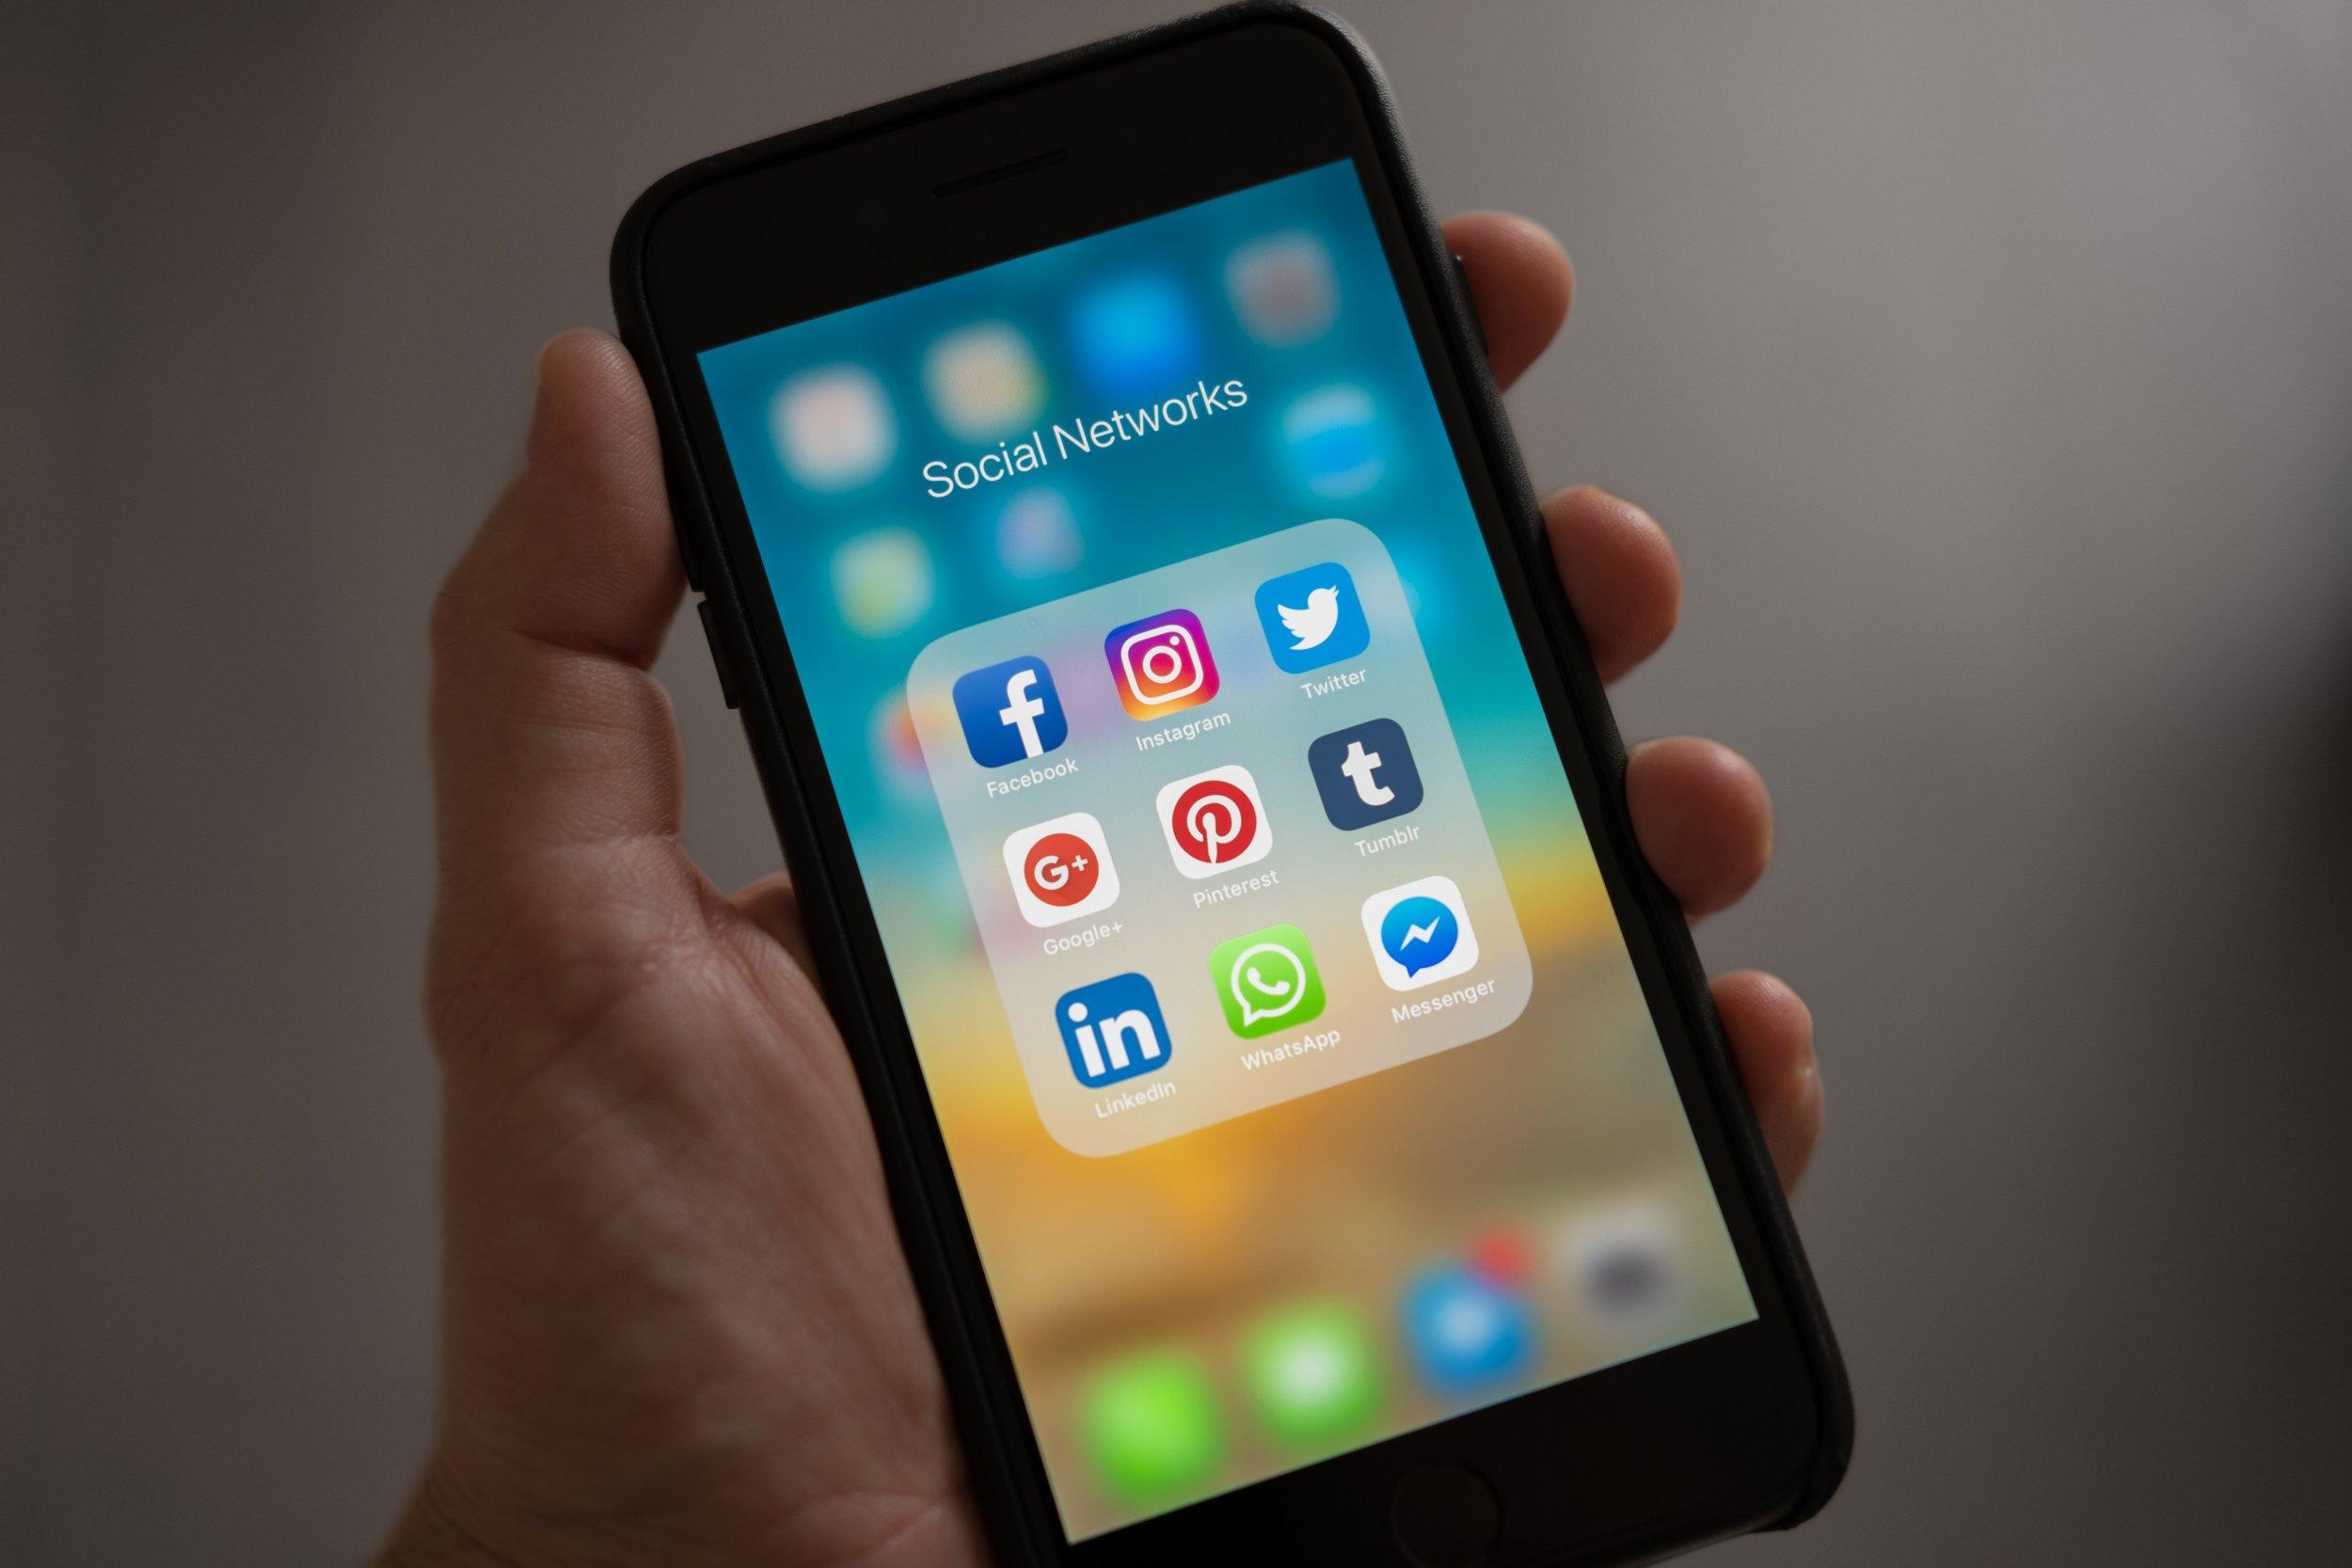 Social networks - Manejo de Redes Sociales